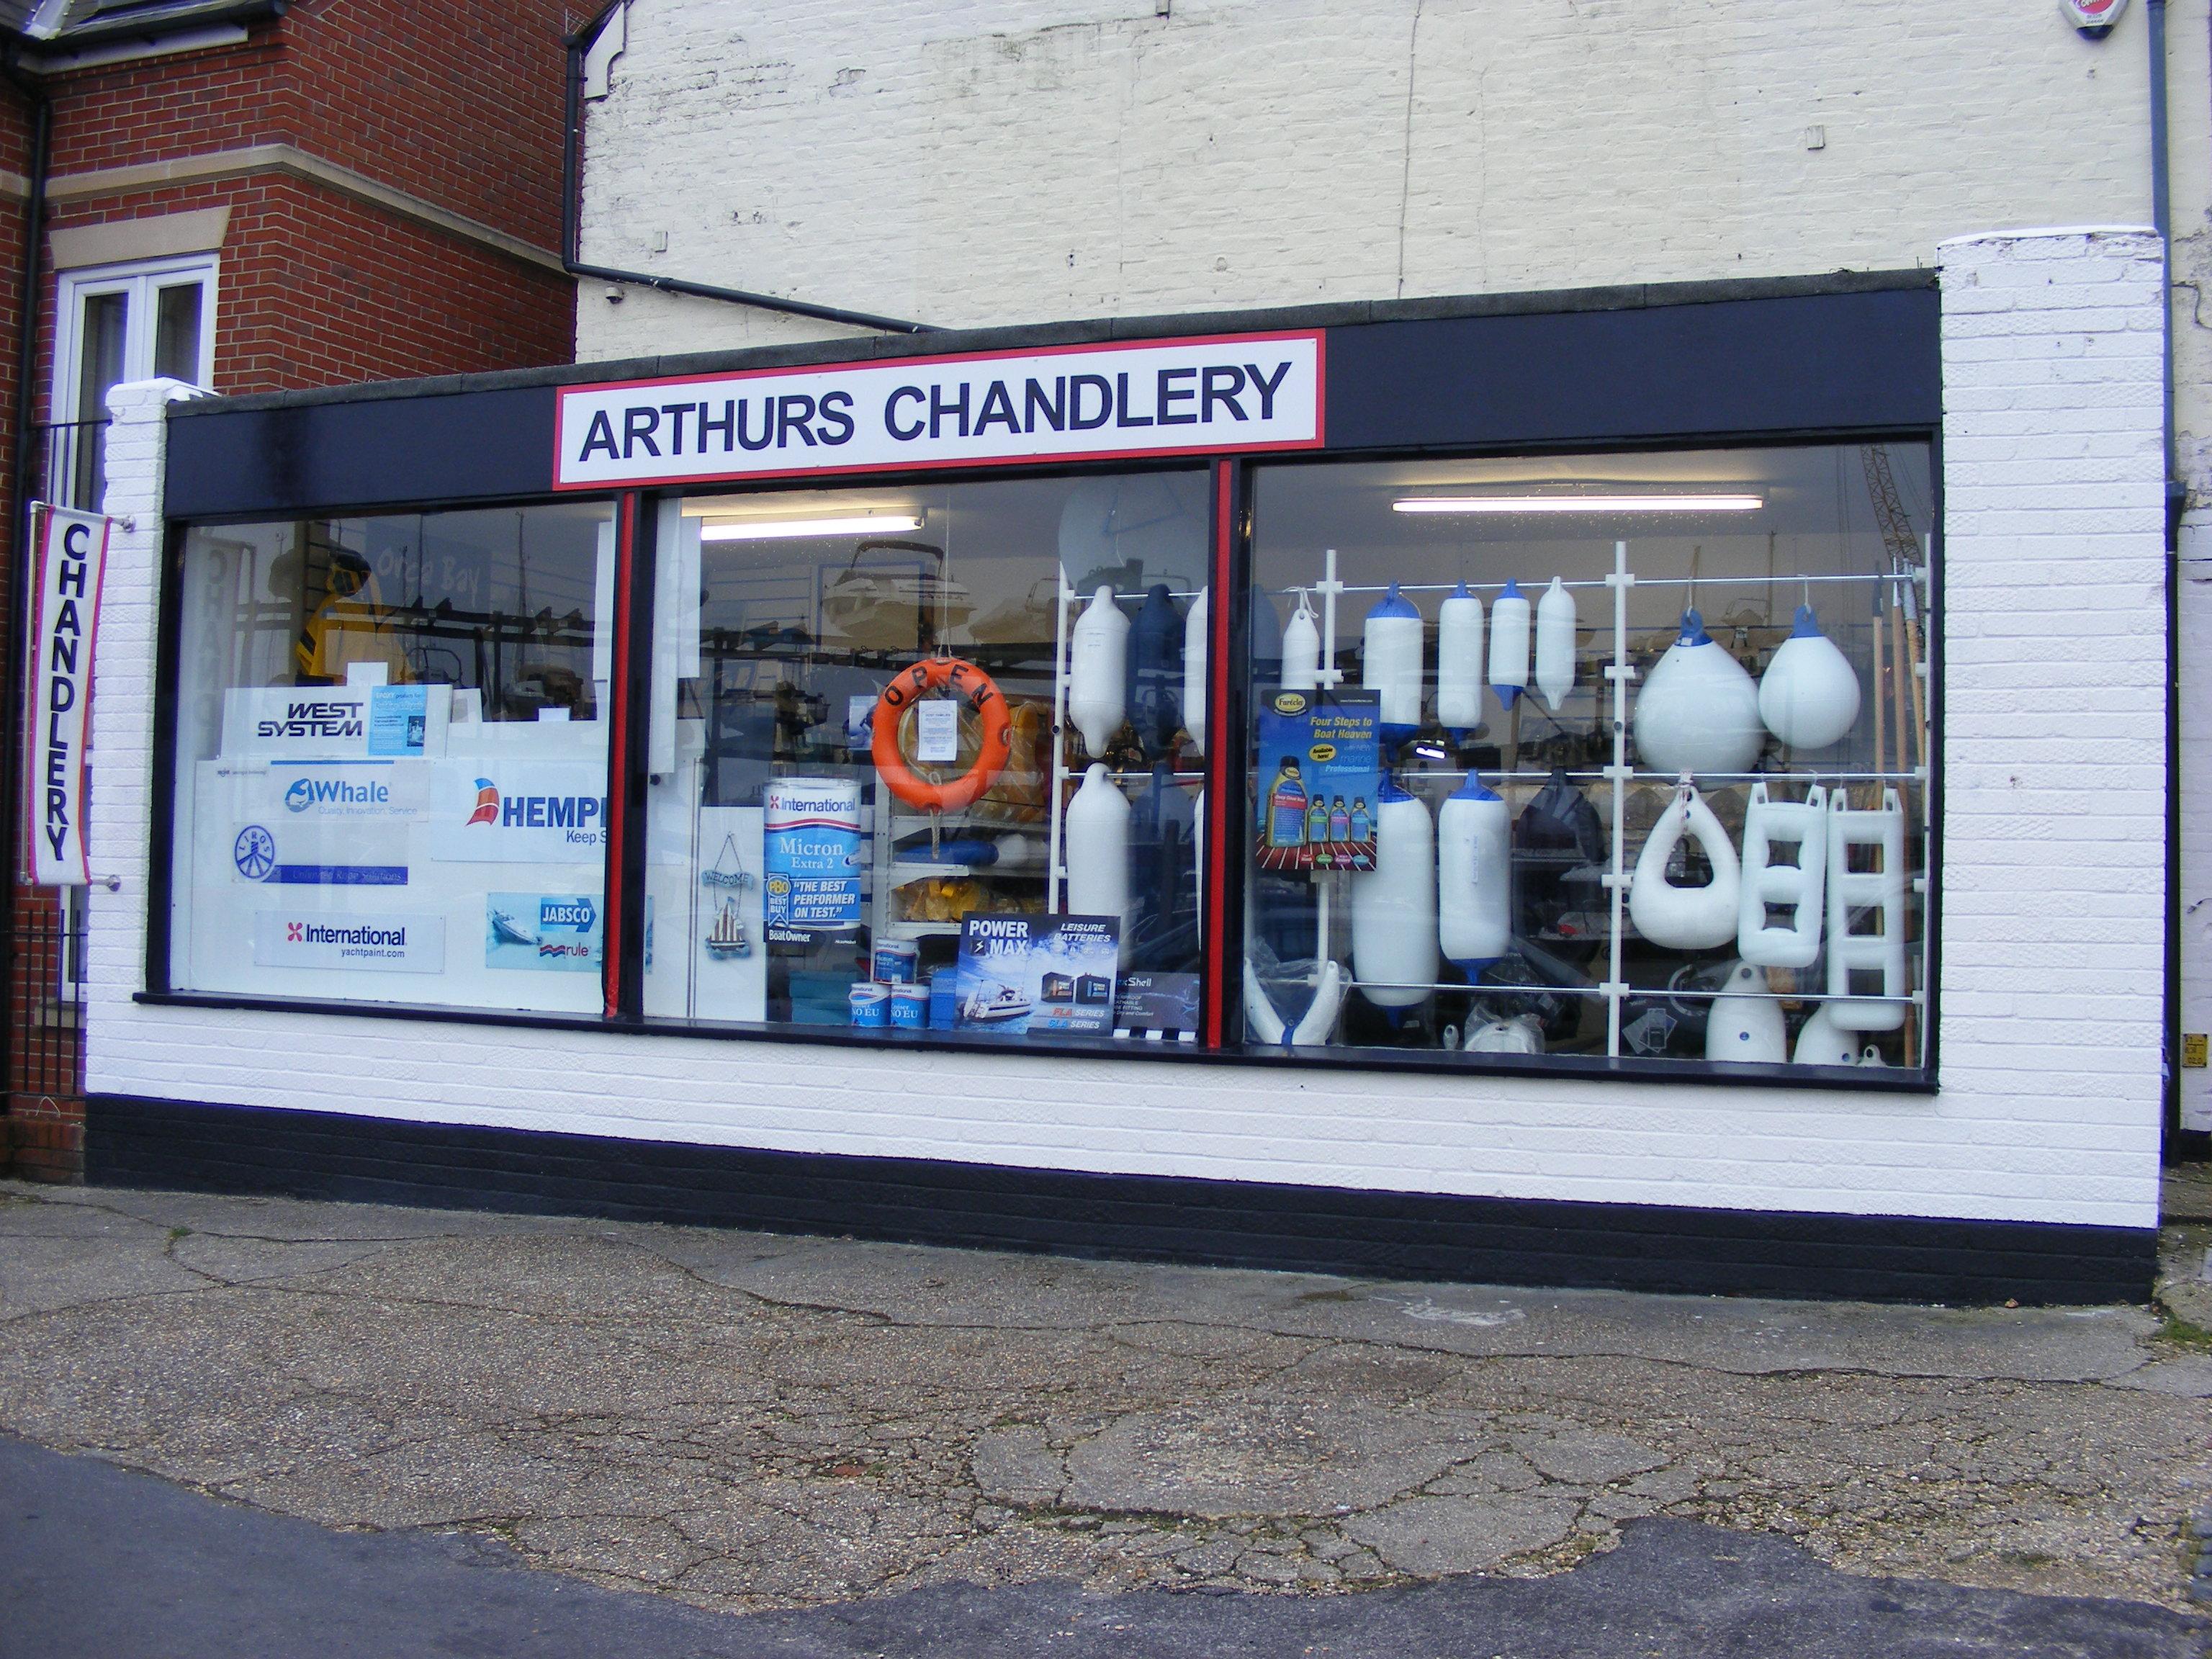 Arthurs Chandlery